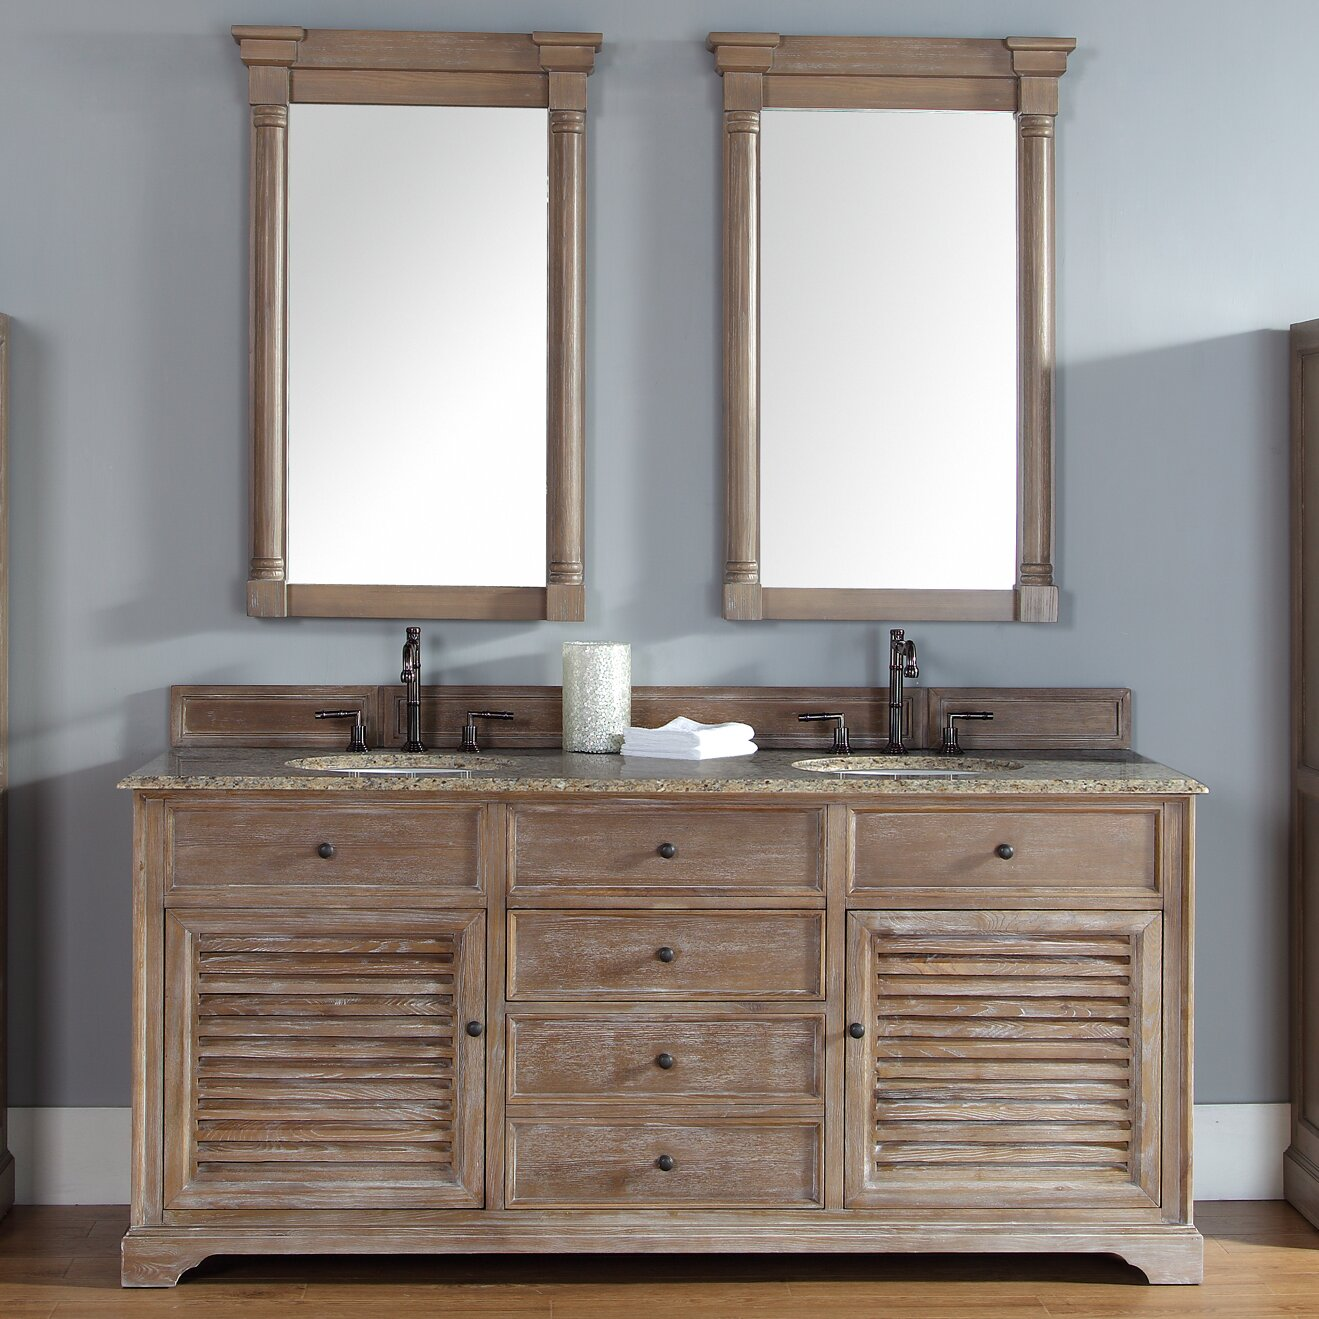 Driftwood Bathroom Vanity James Martin Furniture Savannah 72 Double Driftwood Bathroom